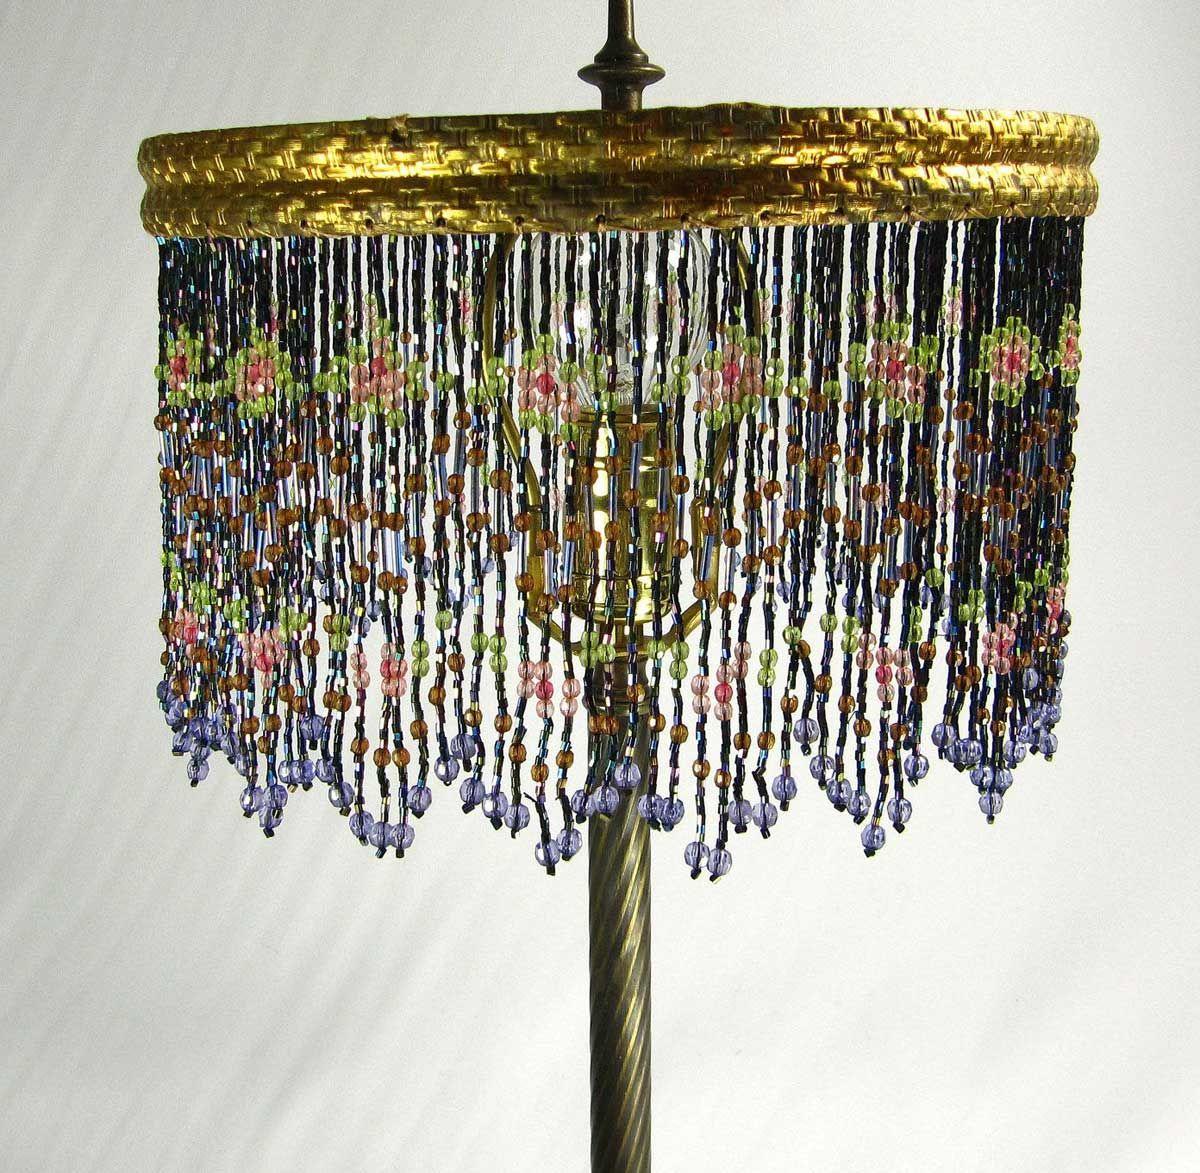 How To Make A Beaded Lamp Shade Beaded Lampshade Beaded Lamps Lamp Shade